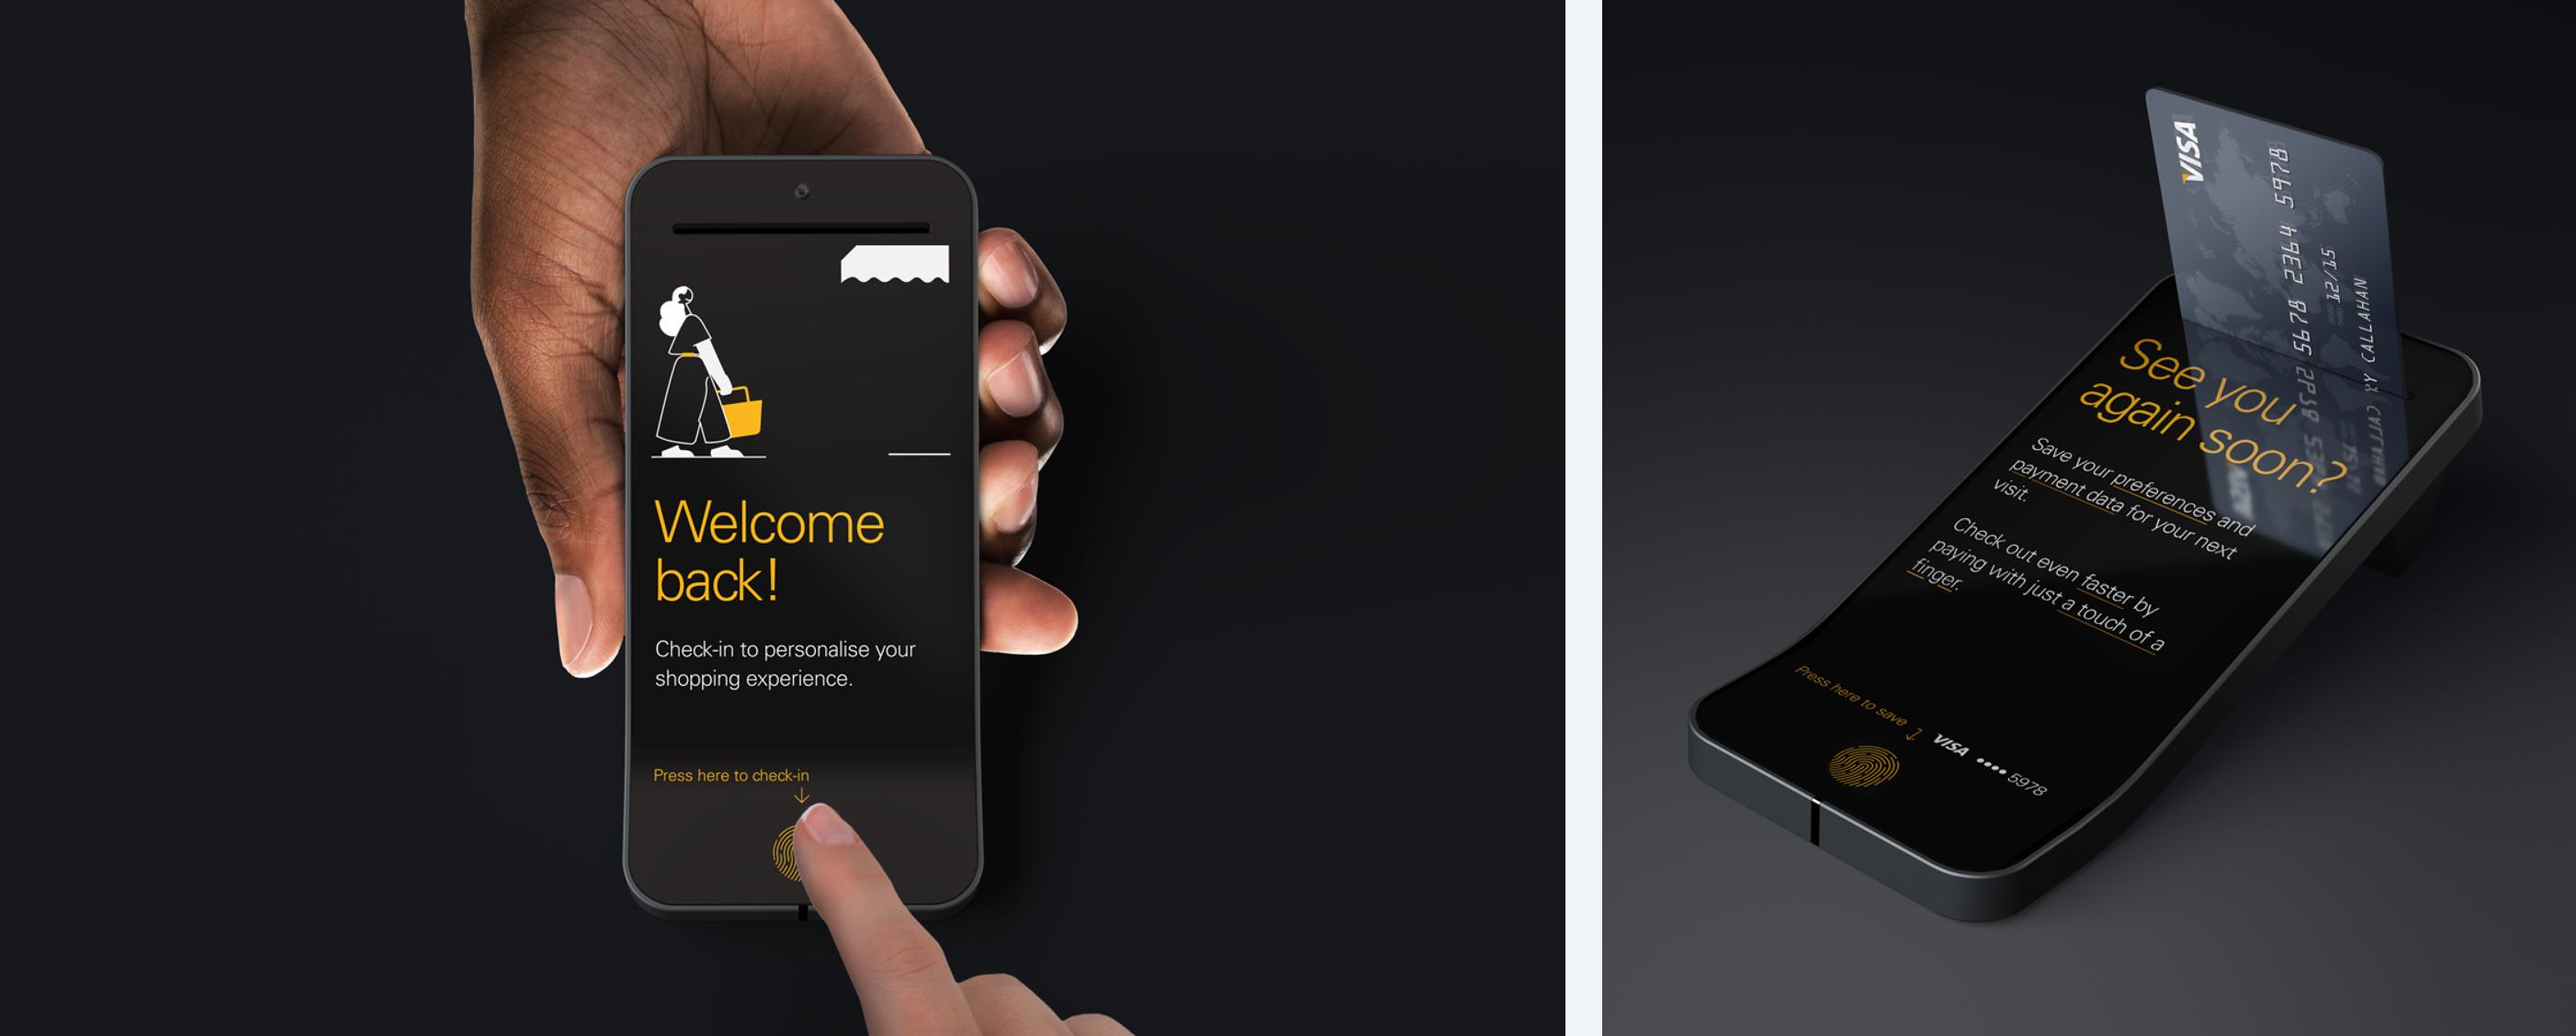 mobile screens fintech